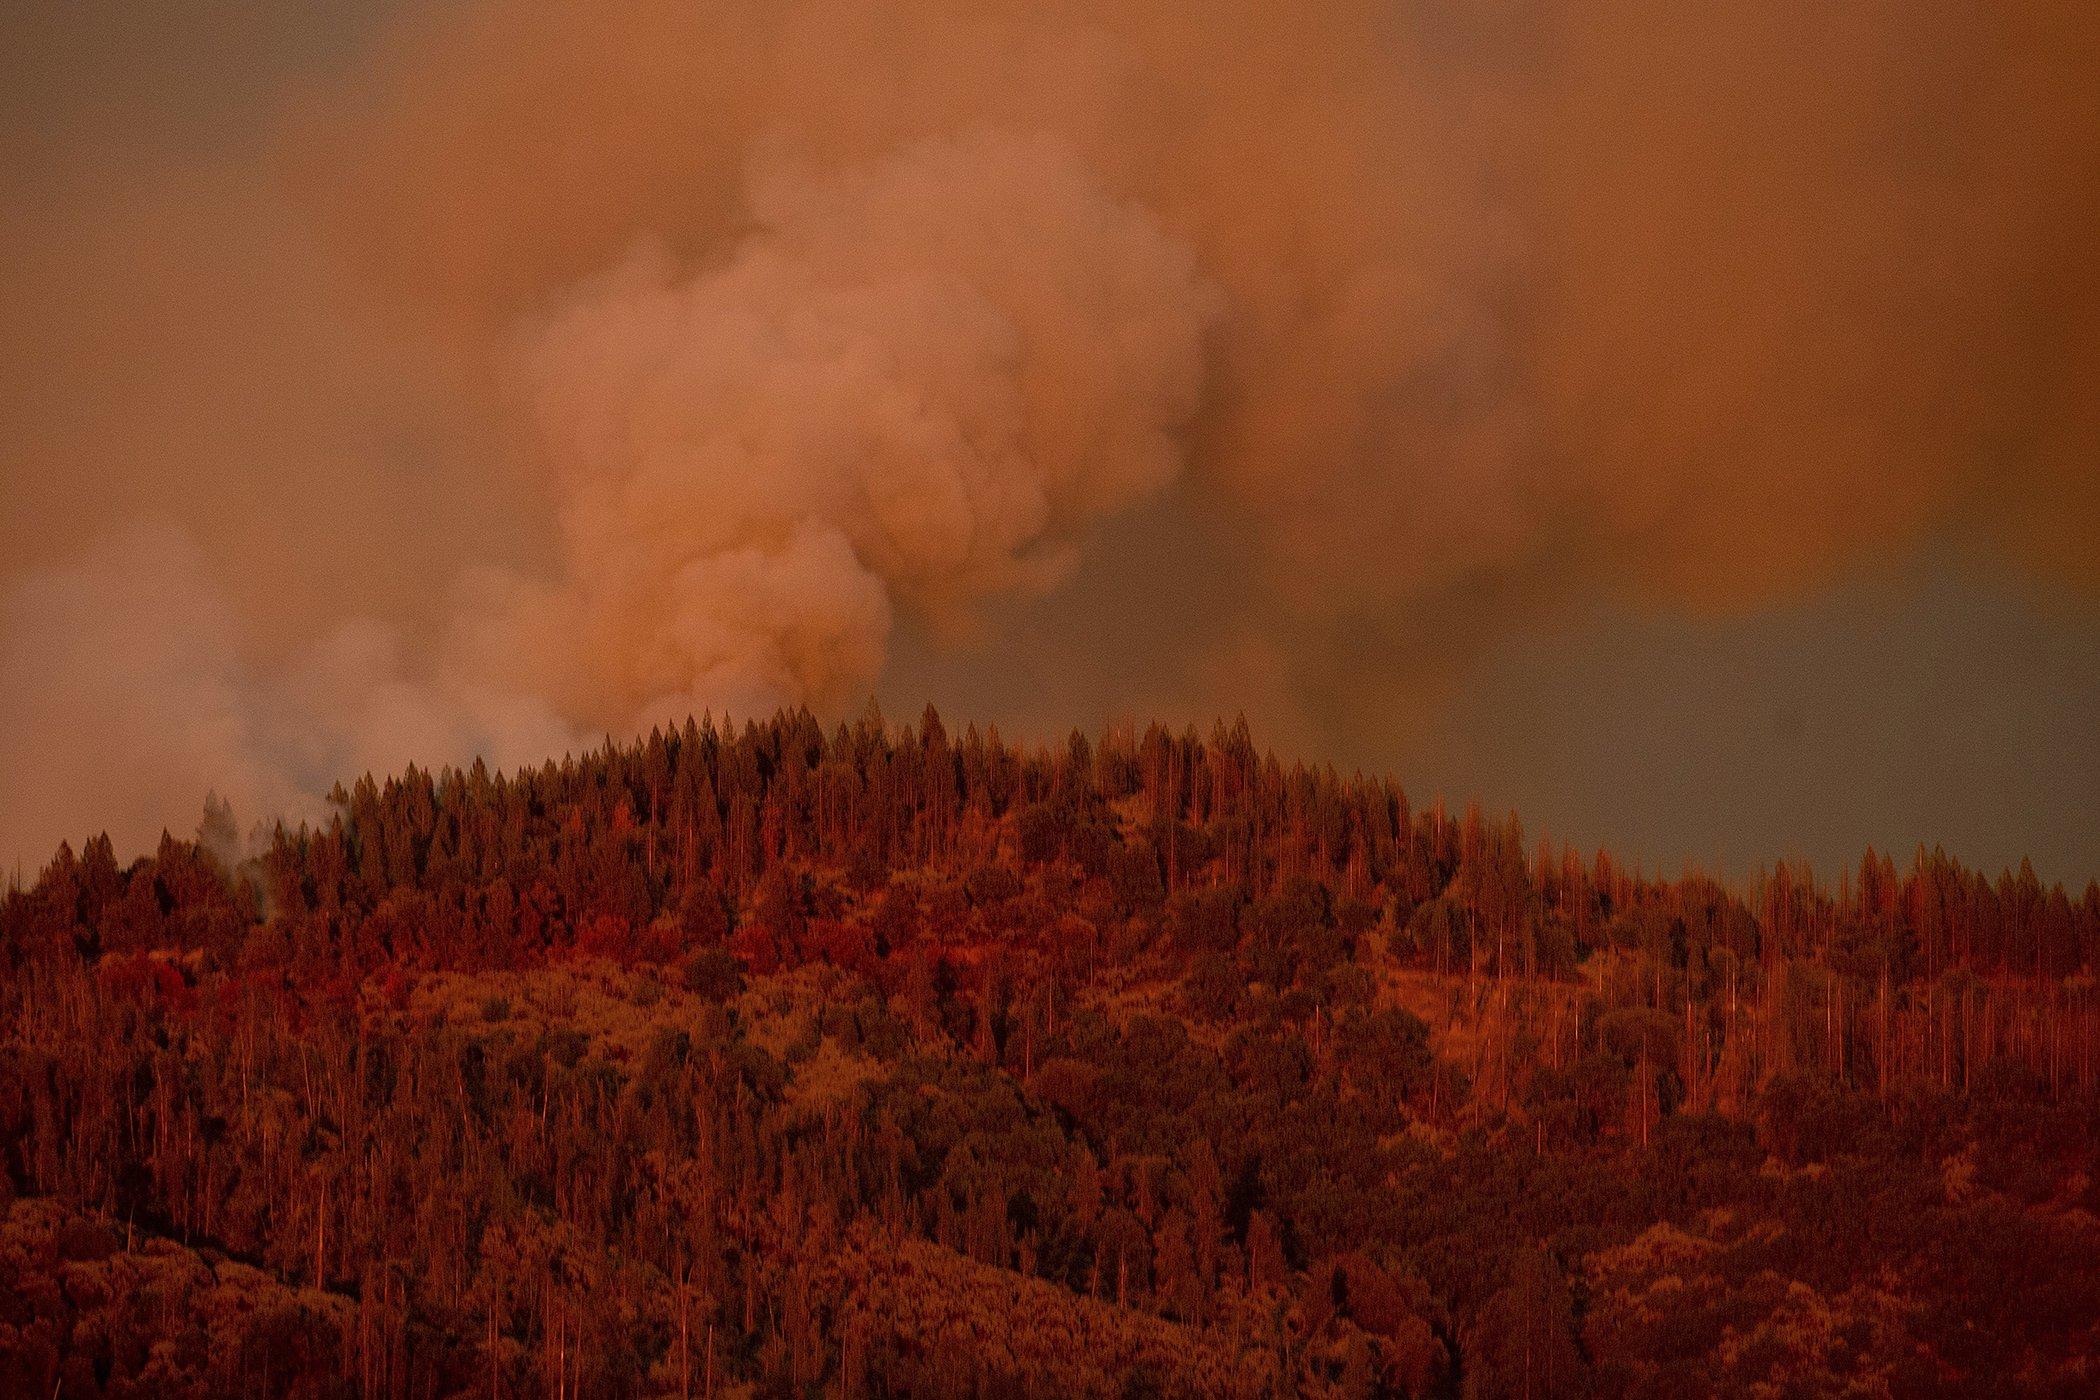 Environmental-Photos-July-California-Wildfires.jpg